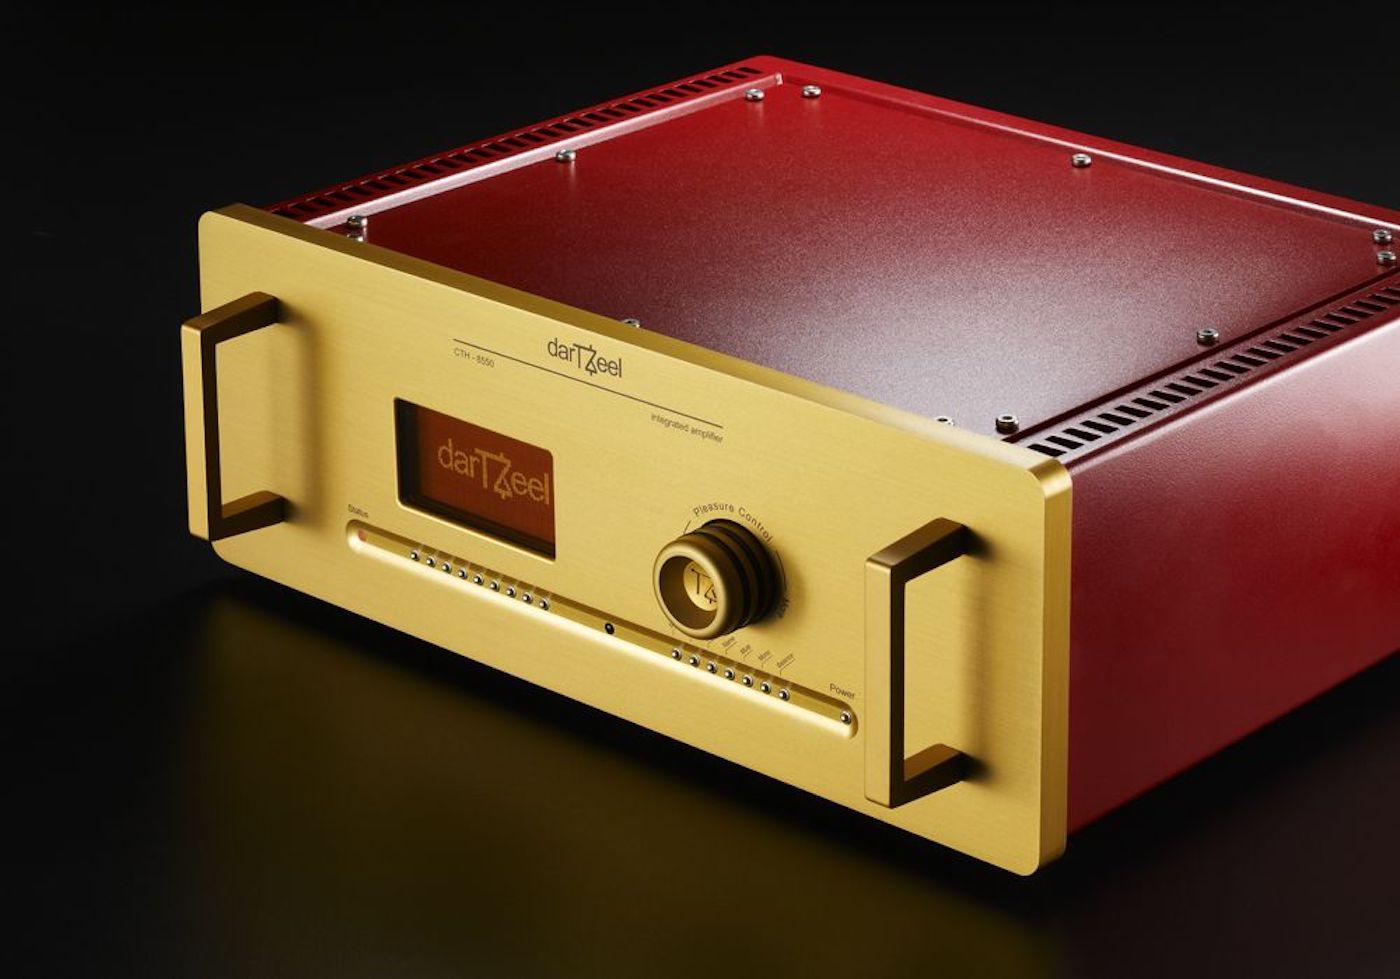 darTZeel CTH-8550 MK11 Dual Mono Integrated Amplifier